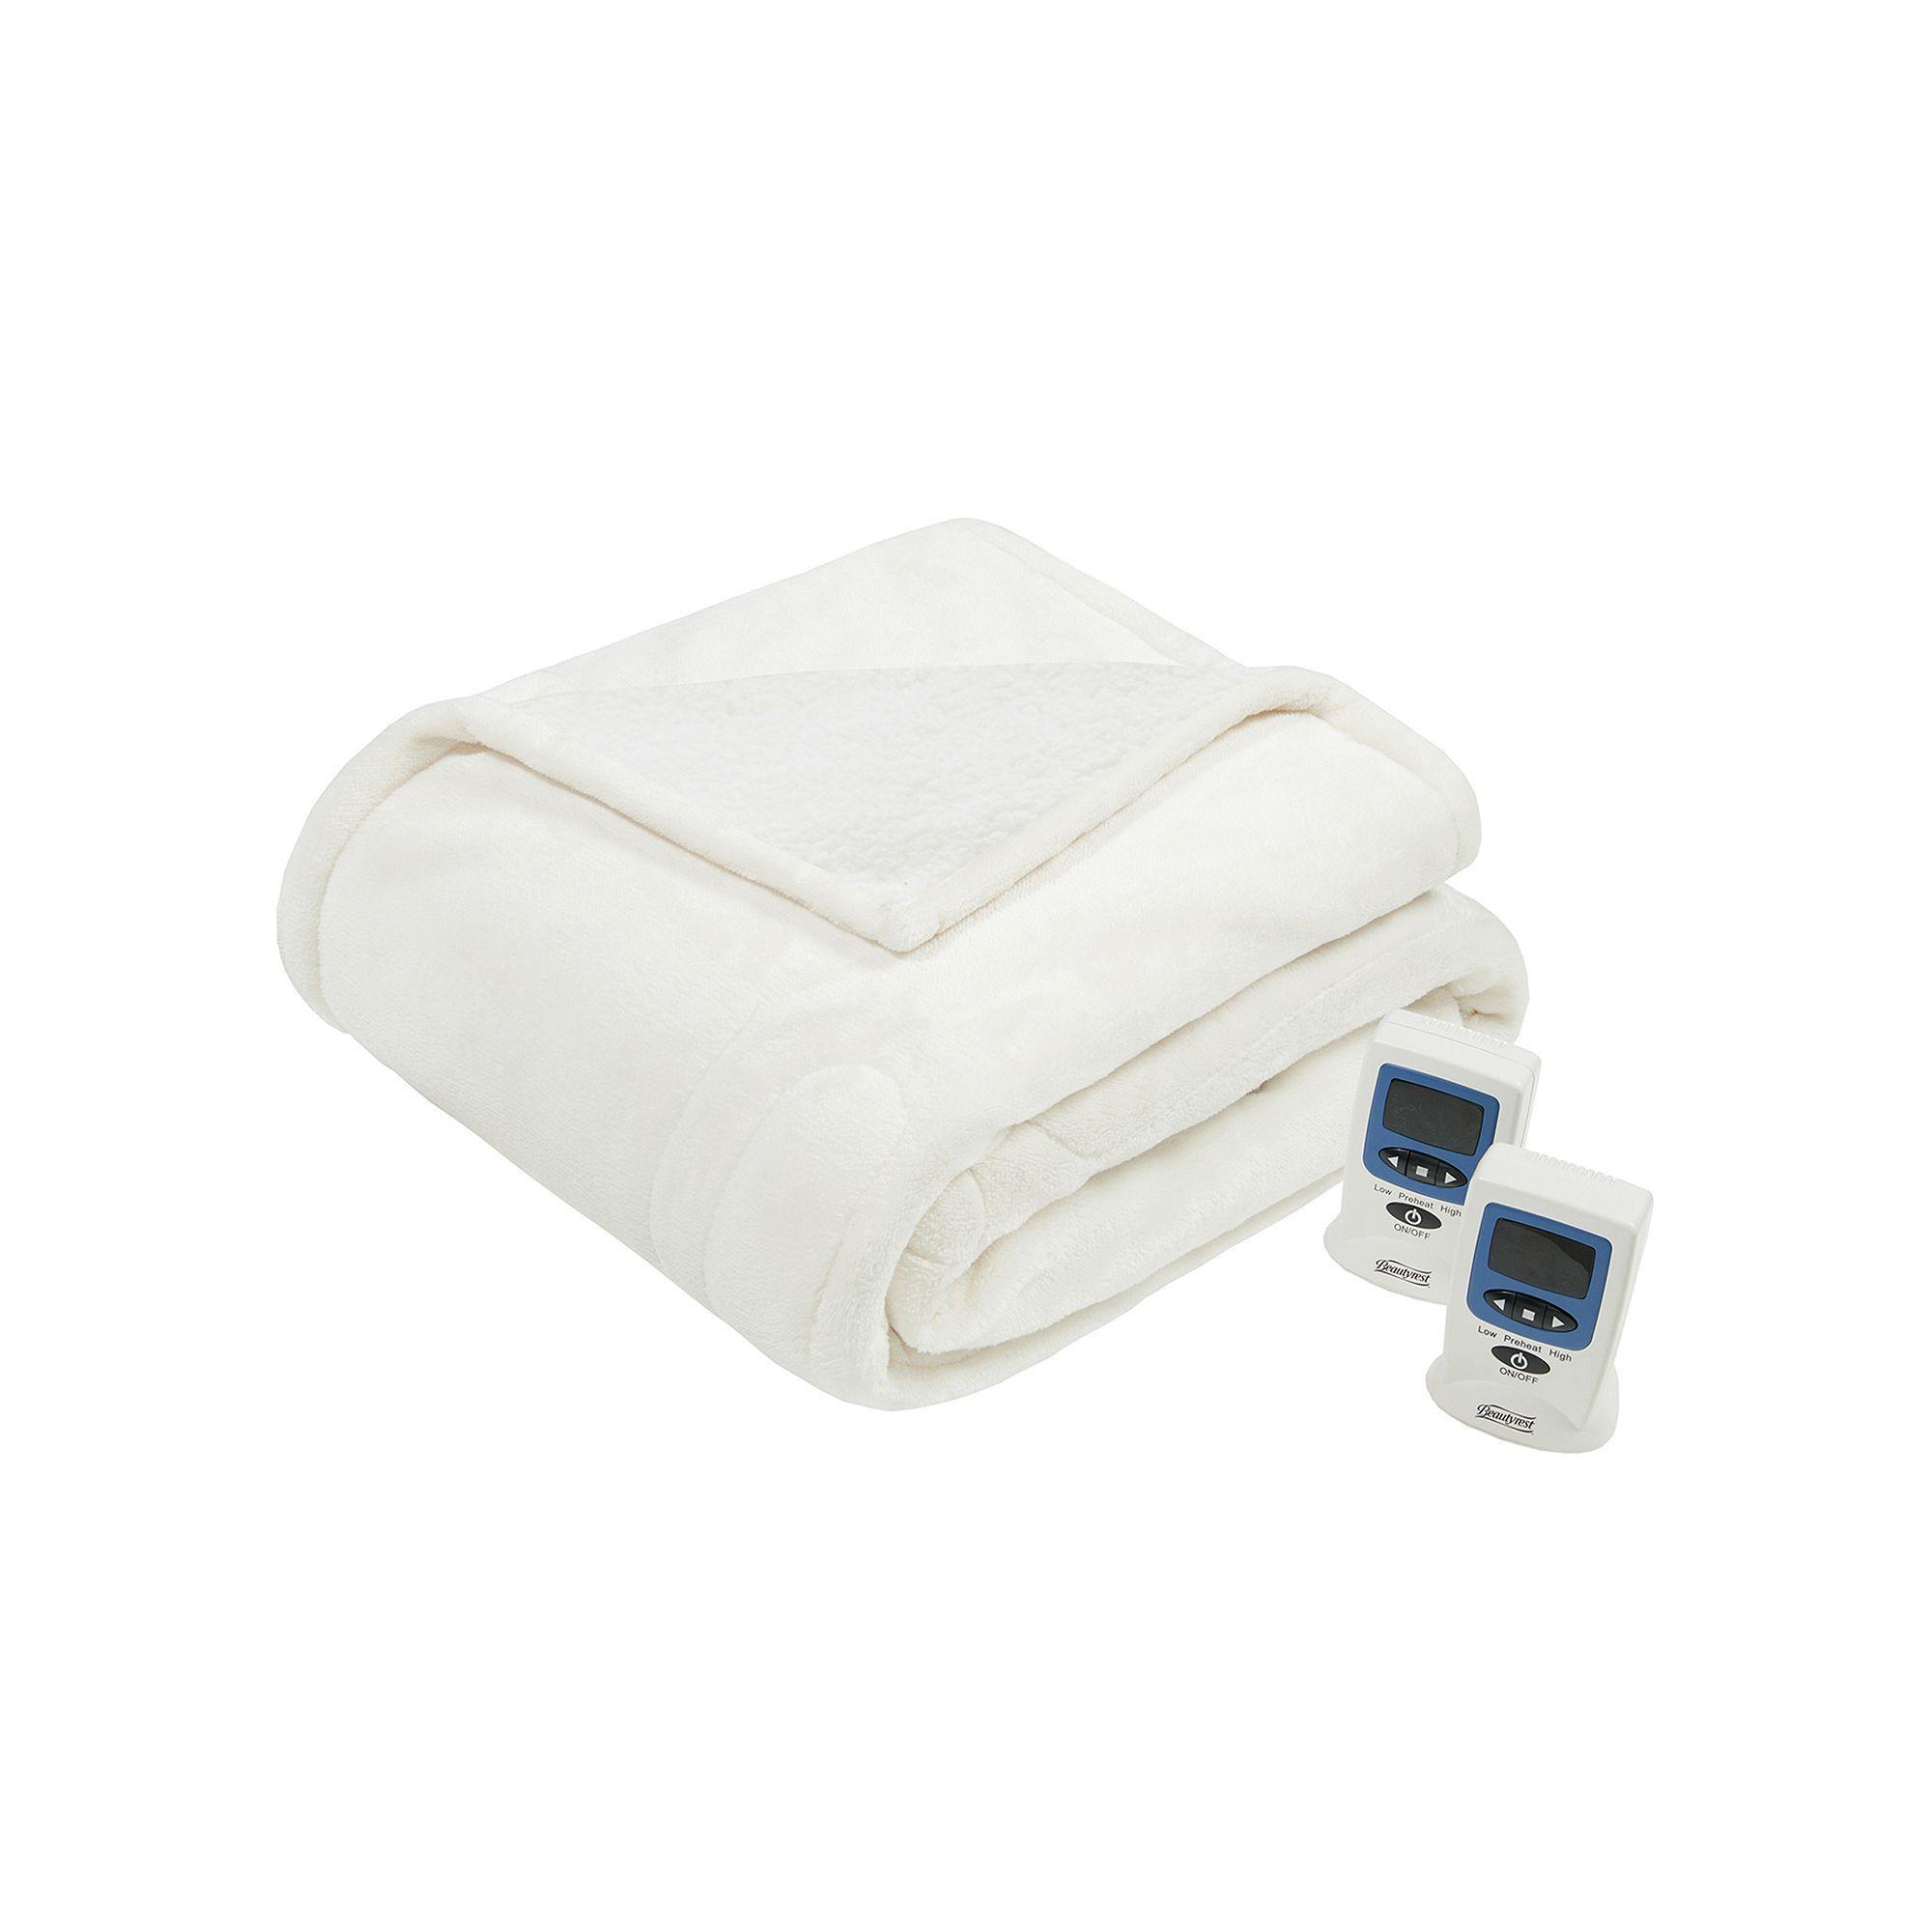 Woolrich Heated Plush Berber Blanket Heated Blanket Electric